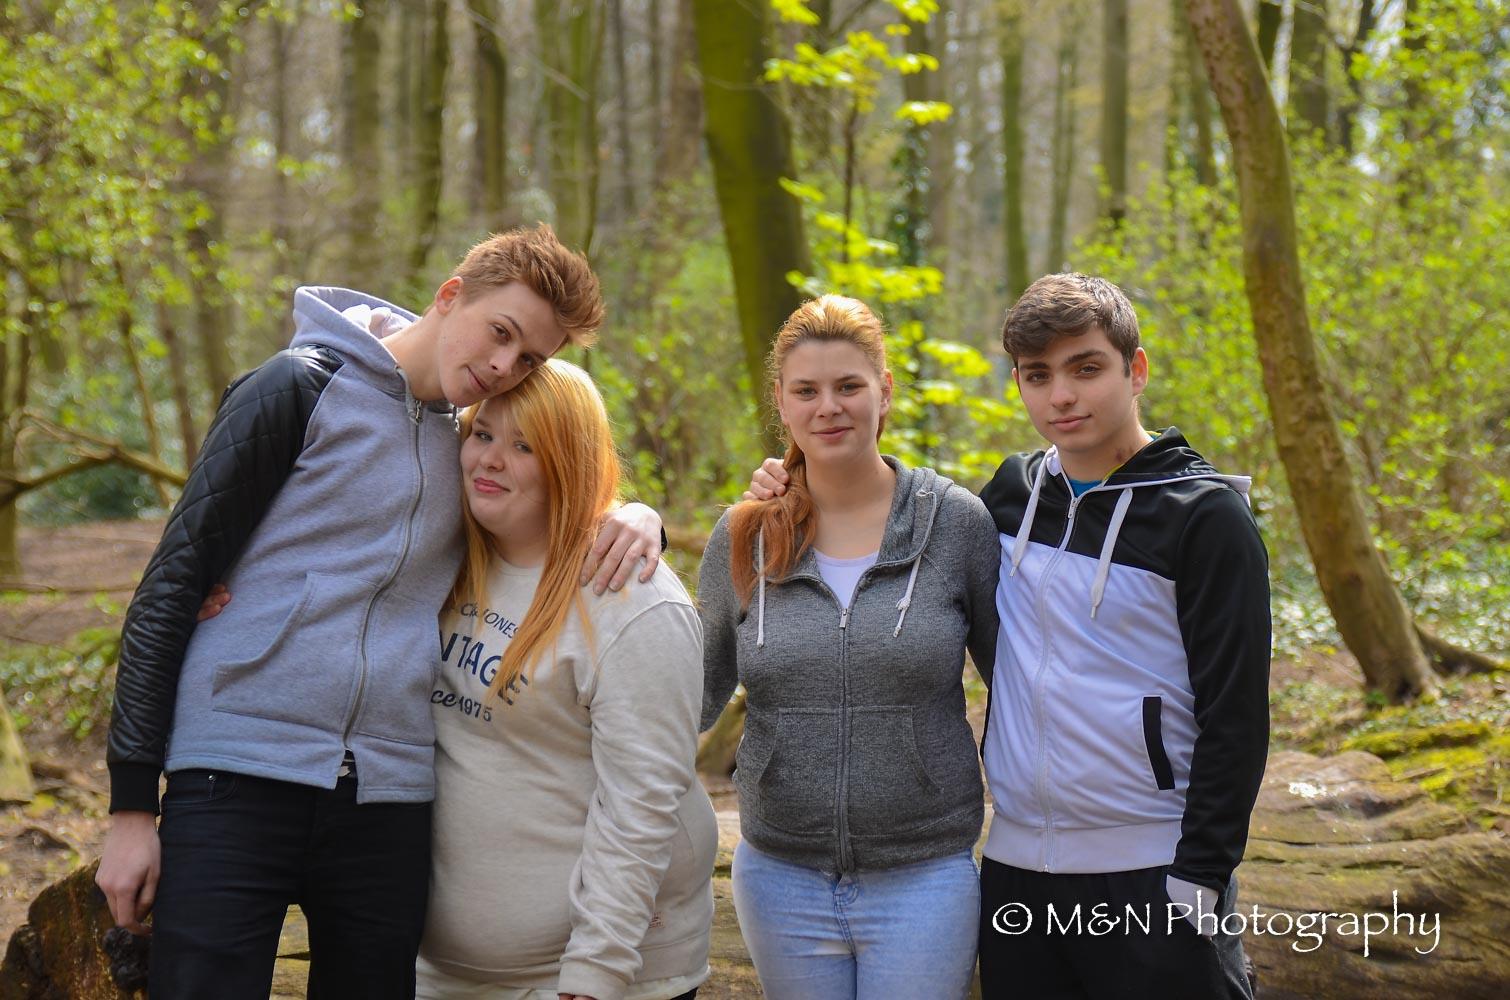 M&N Photography -DSC_5108